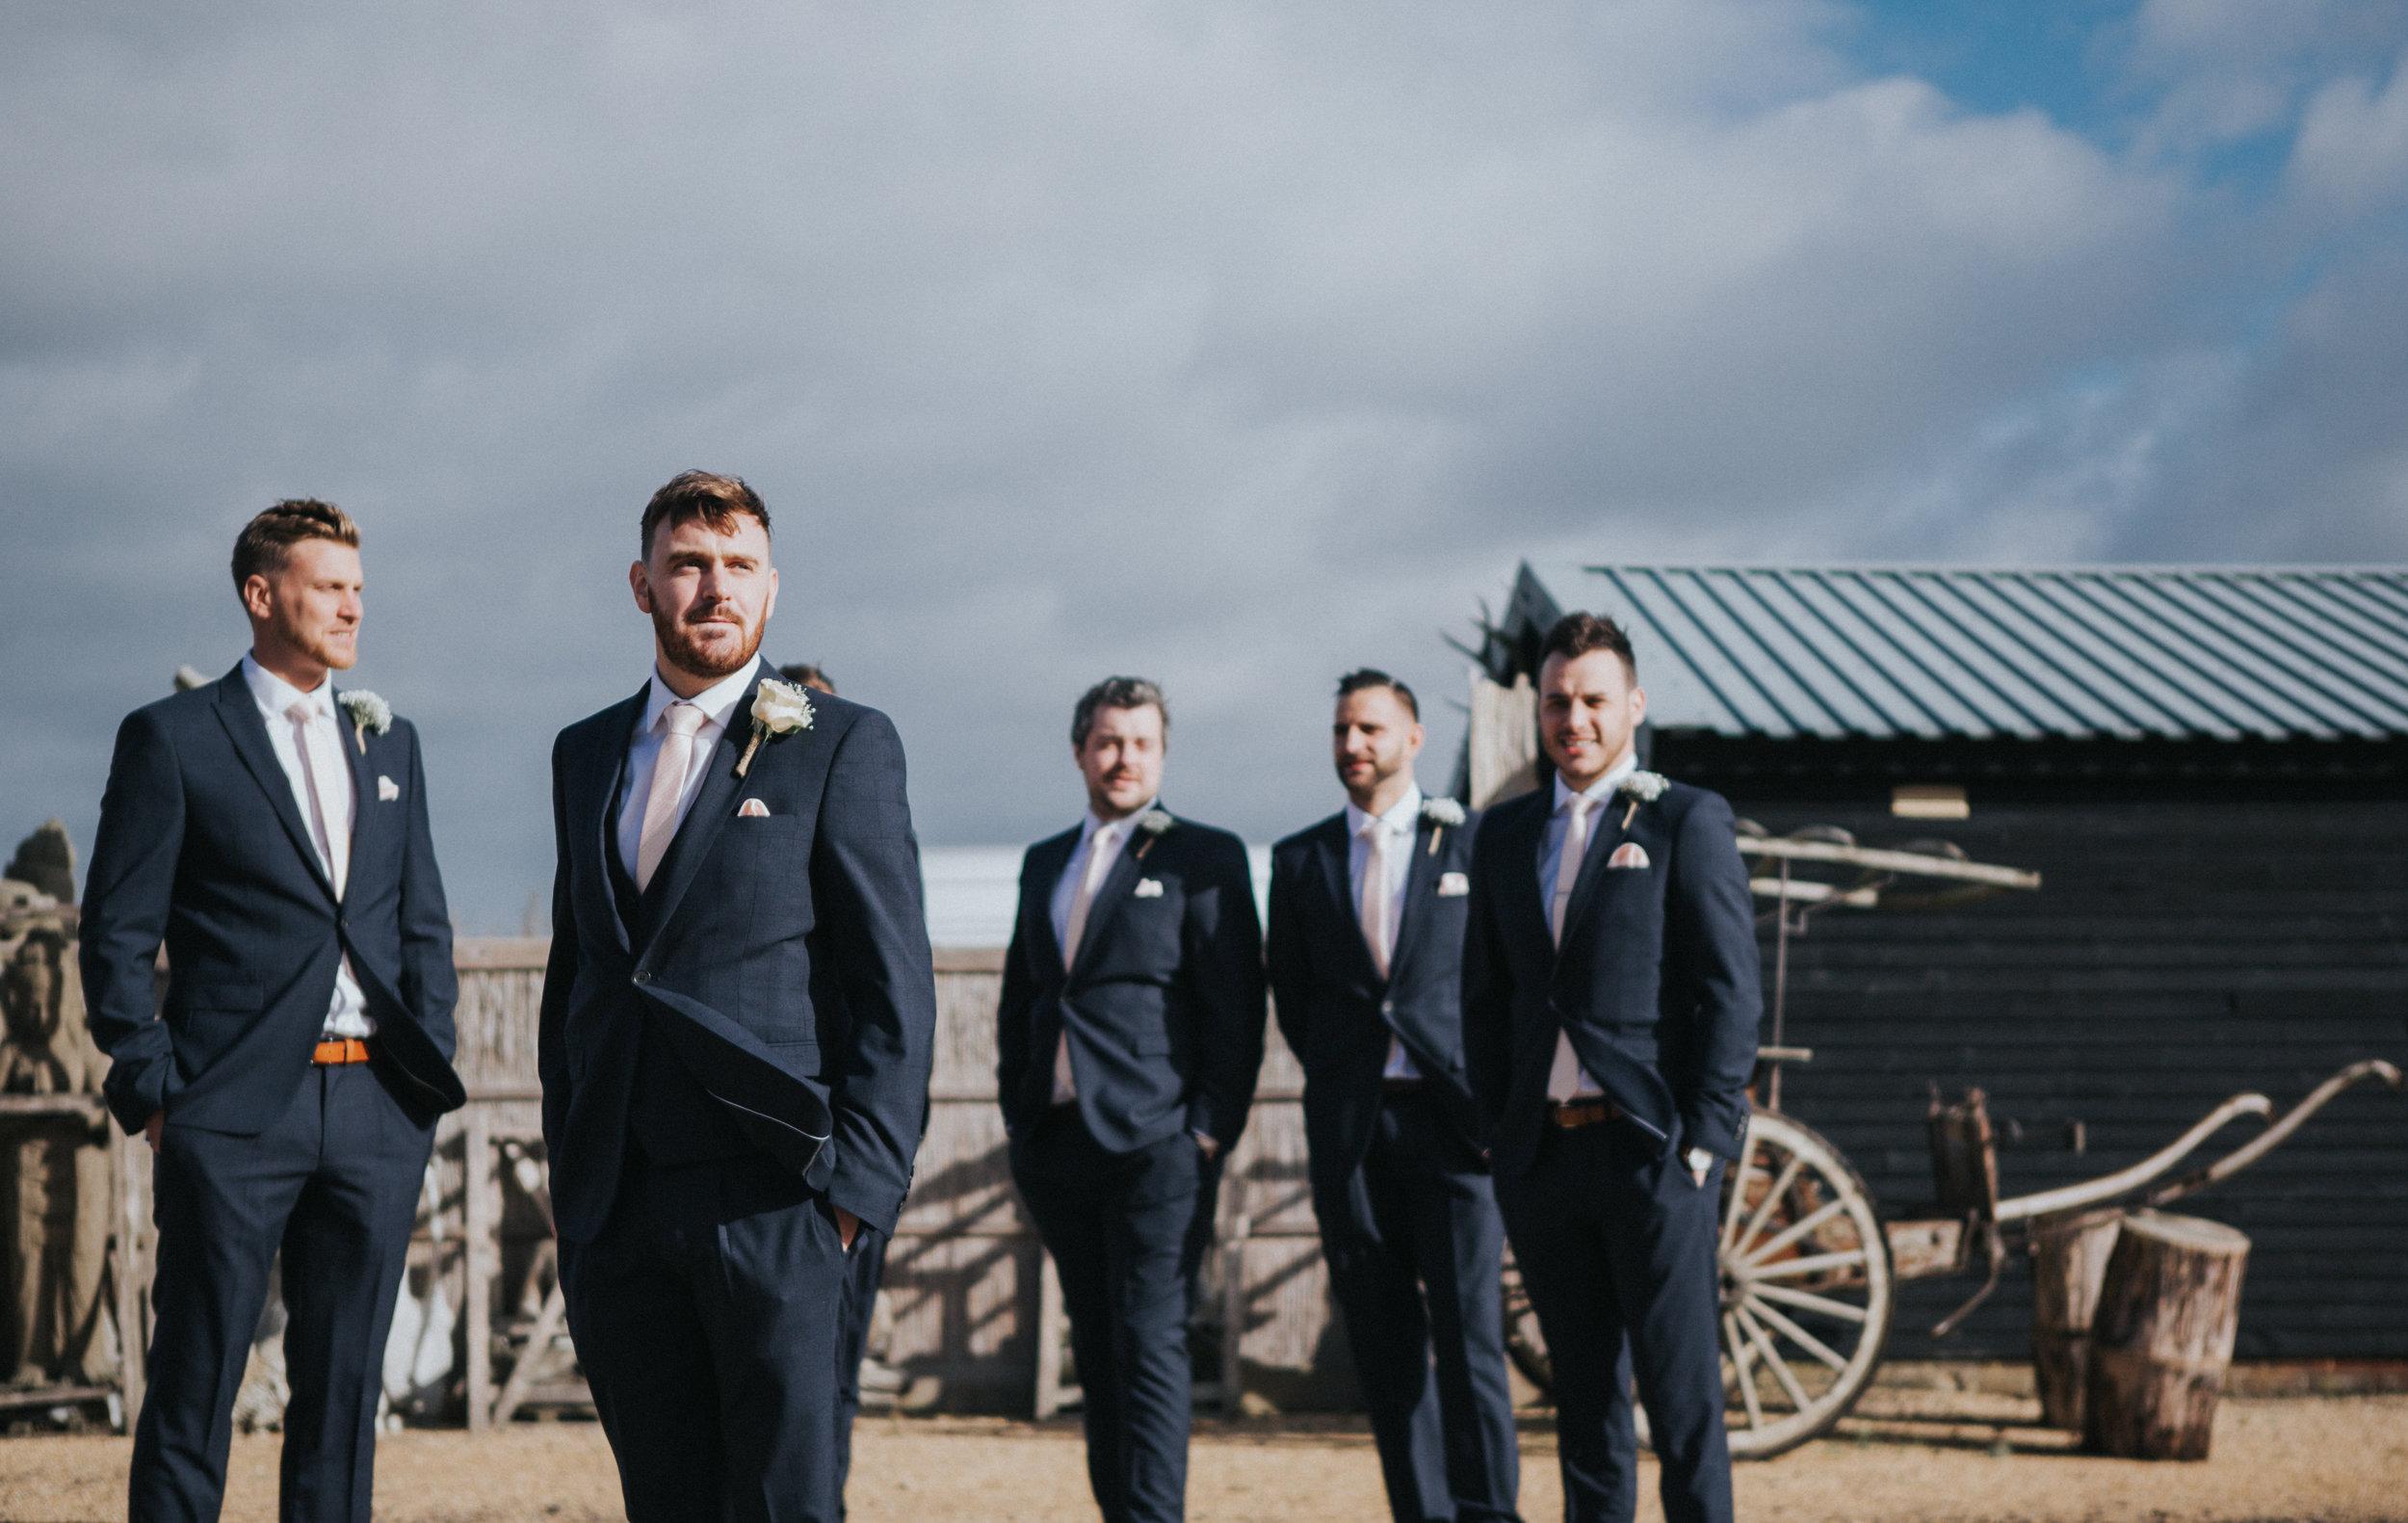 london-hertfordshire-wedding-photography-milling-barn-groom-portrait-11